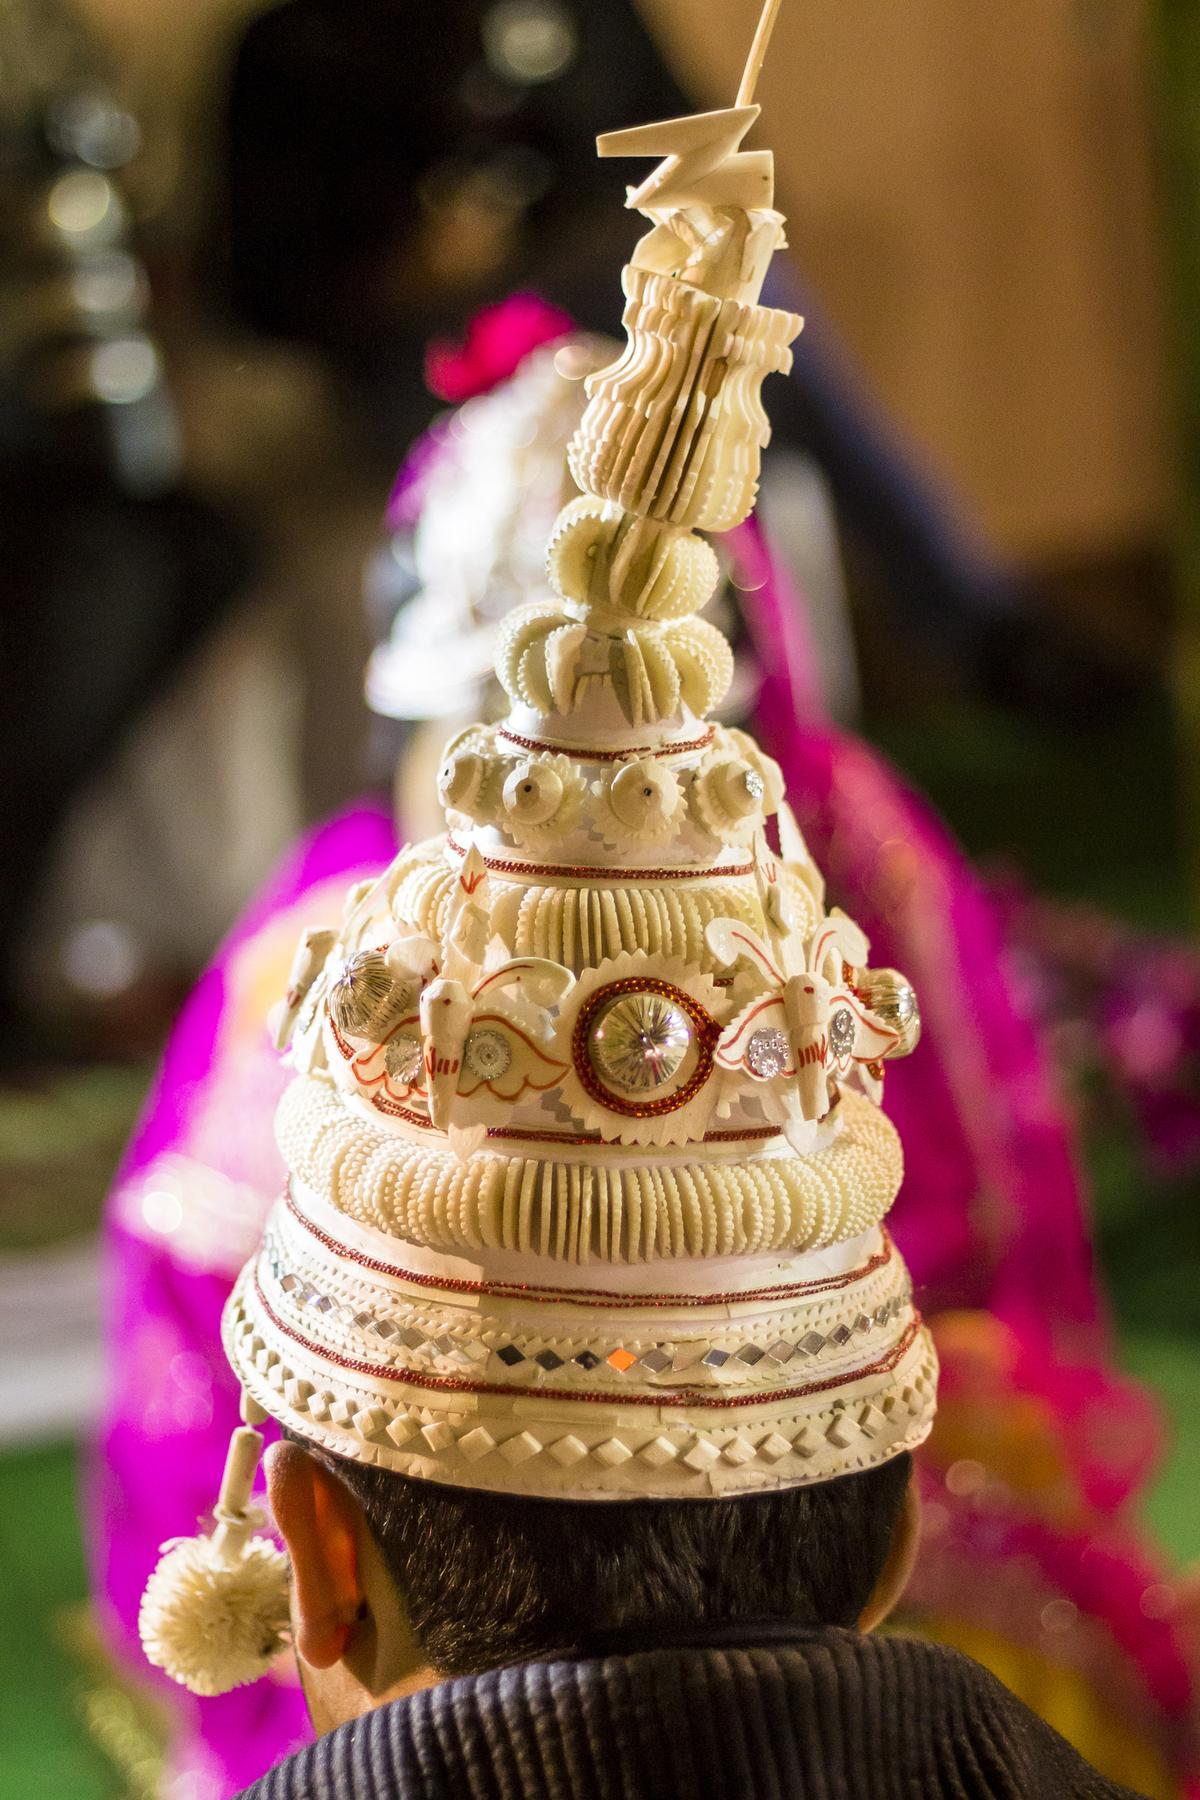 bangladeshi food and culture